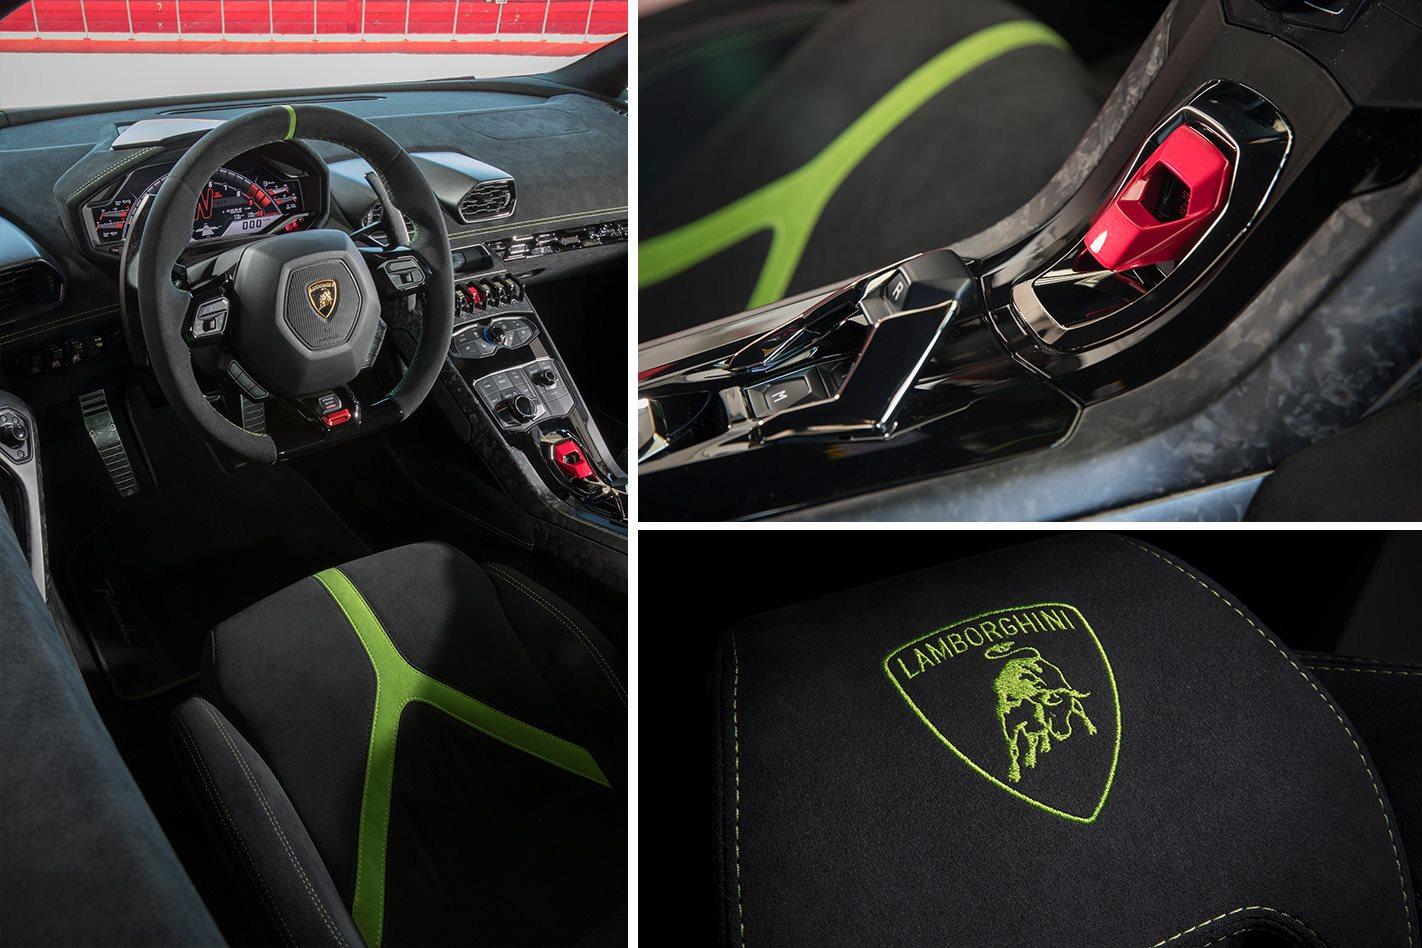 2017 Lamborghini Huracan Performante Air Craft